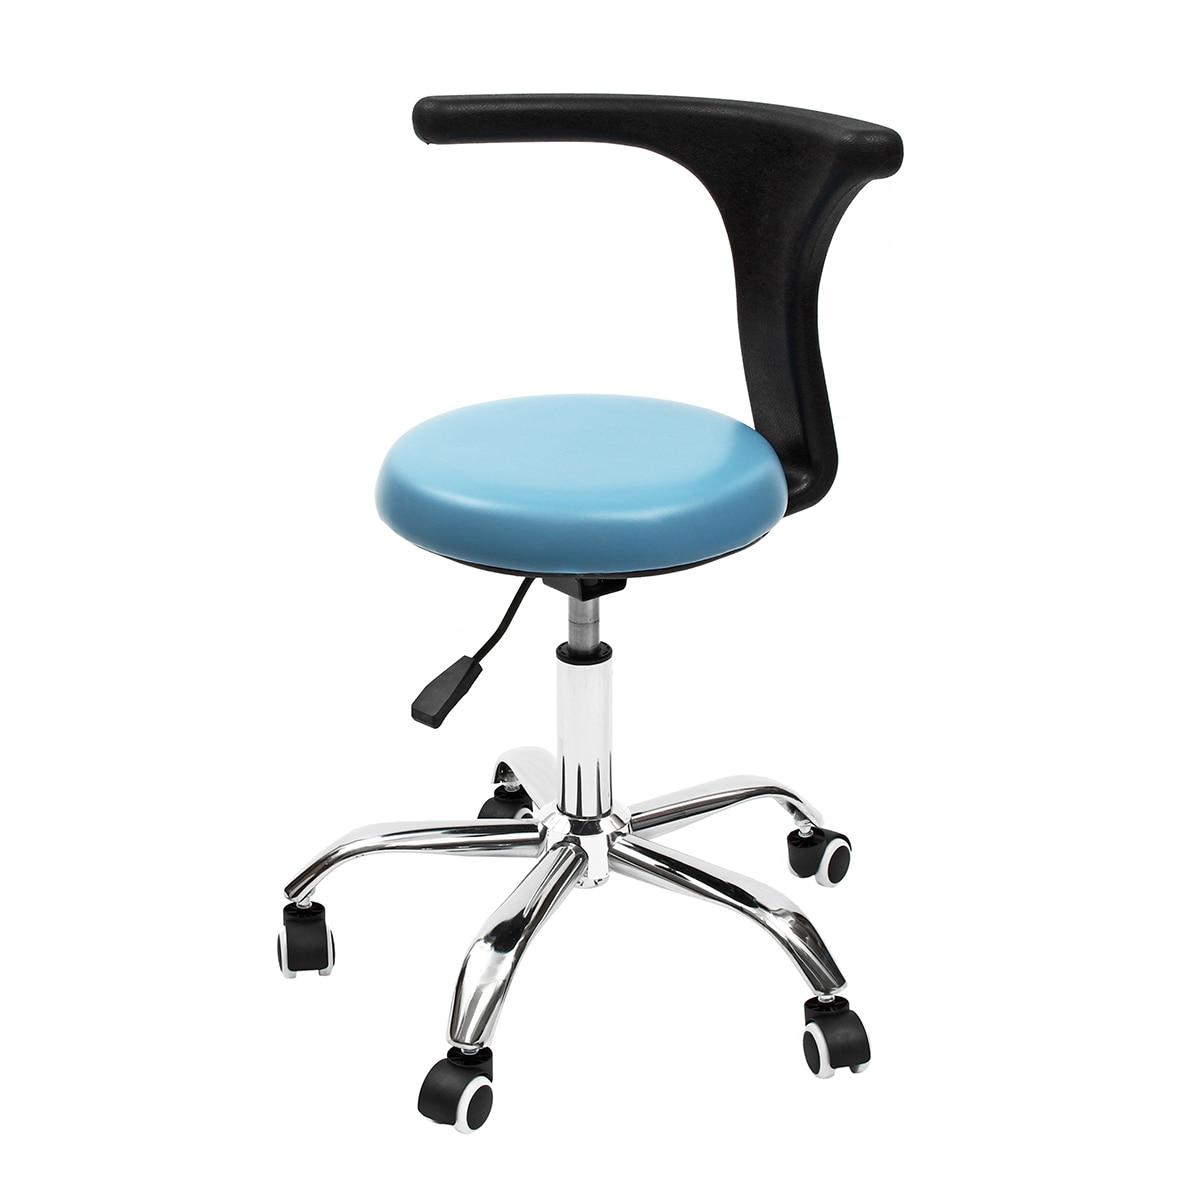 Lfy Moderne Designe Barber Swivel Leder Executive Computer Büro Dekoration Gaming Salon Stuhl Schönheit Synthetische Metall Kommerziellen Möbel